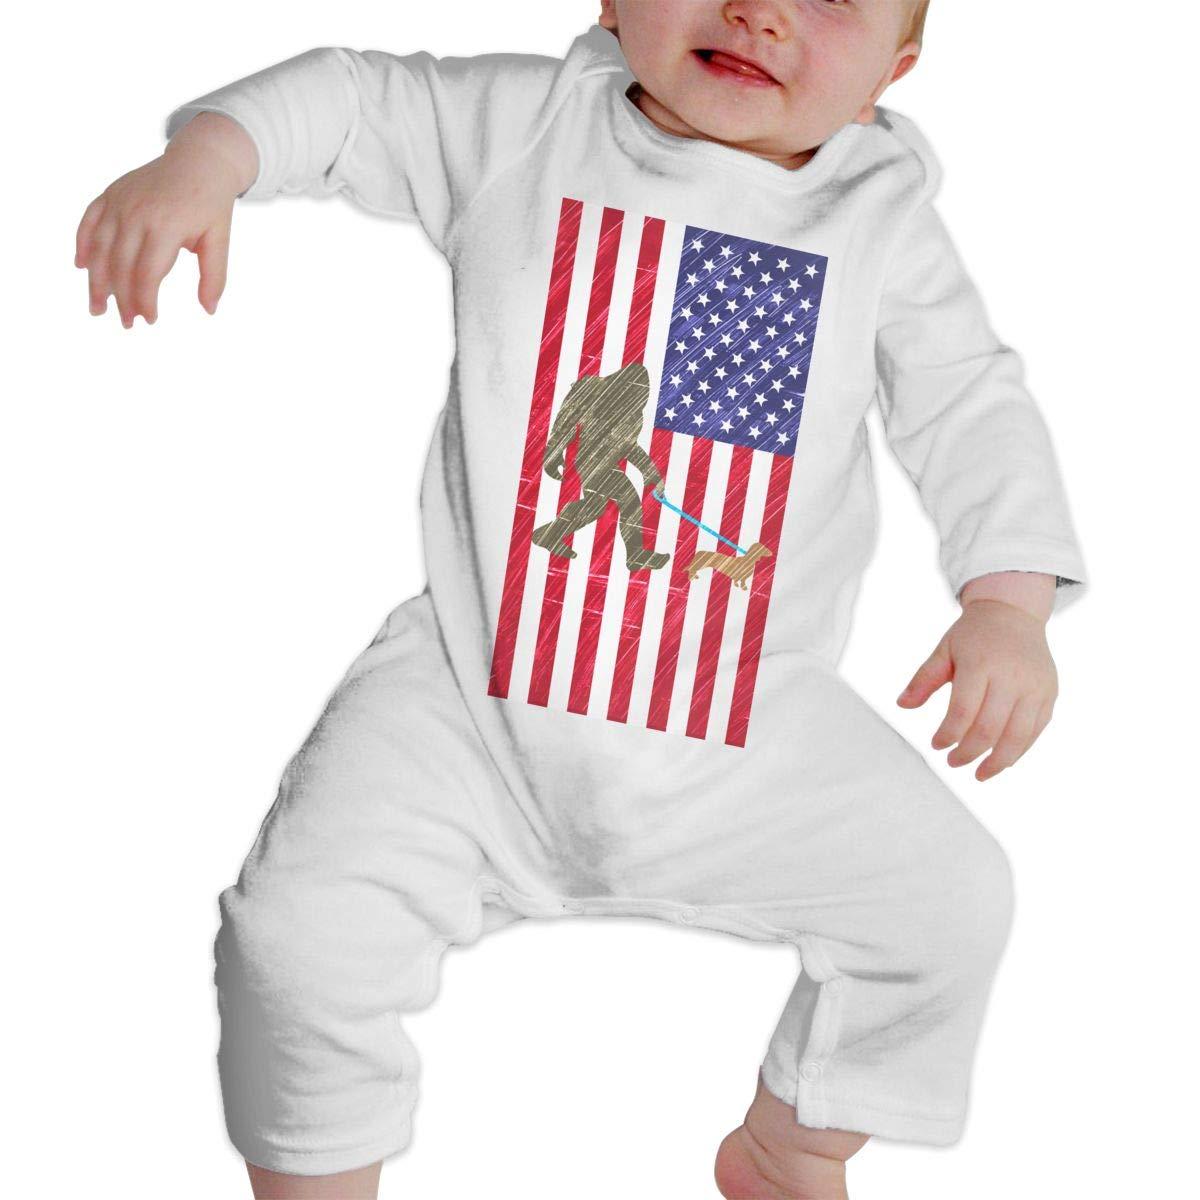 Infant Baby Boys Girls Cotton Long Sleeve Bigfoot Walking Dachshund in American Flag Romper Bodysuit Romper Clothes